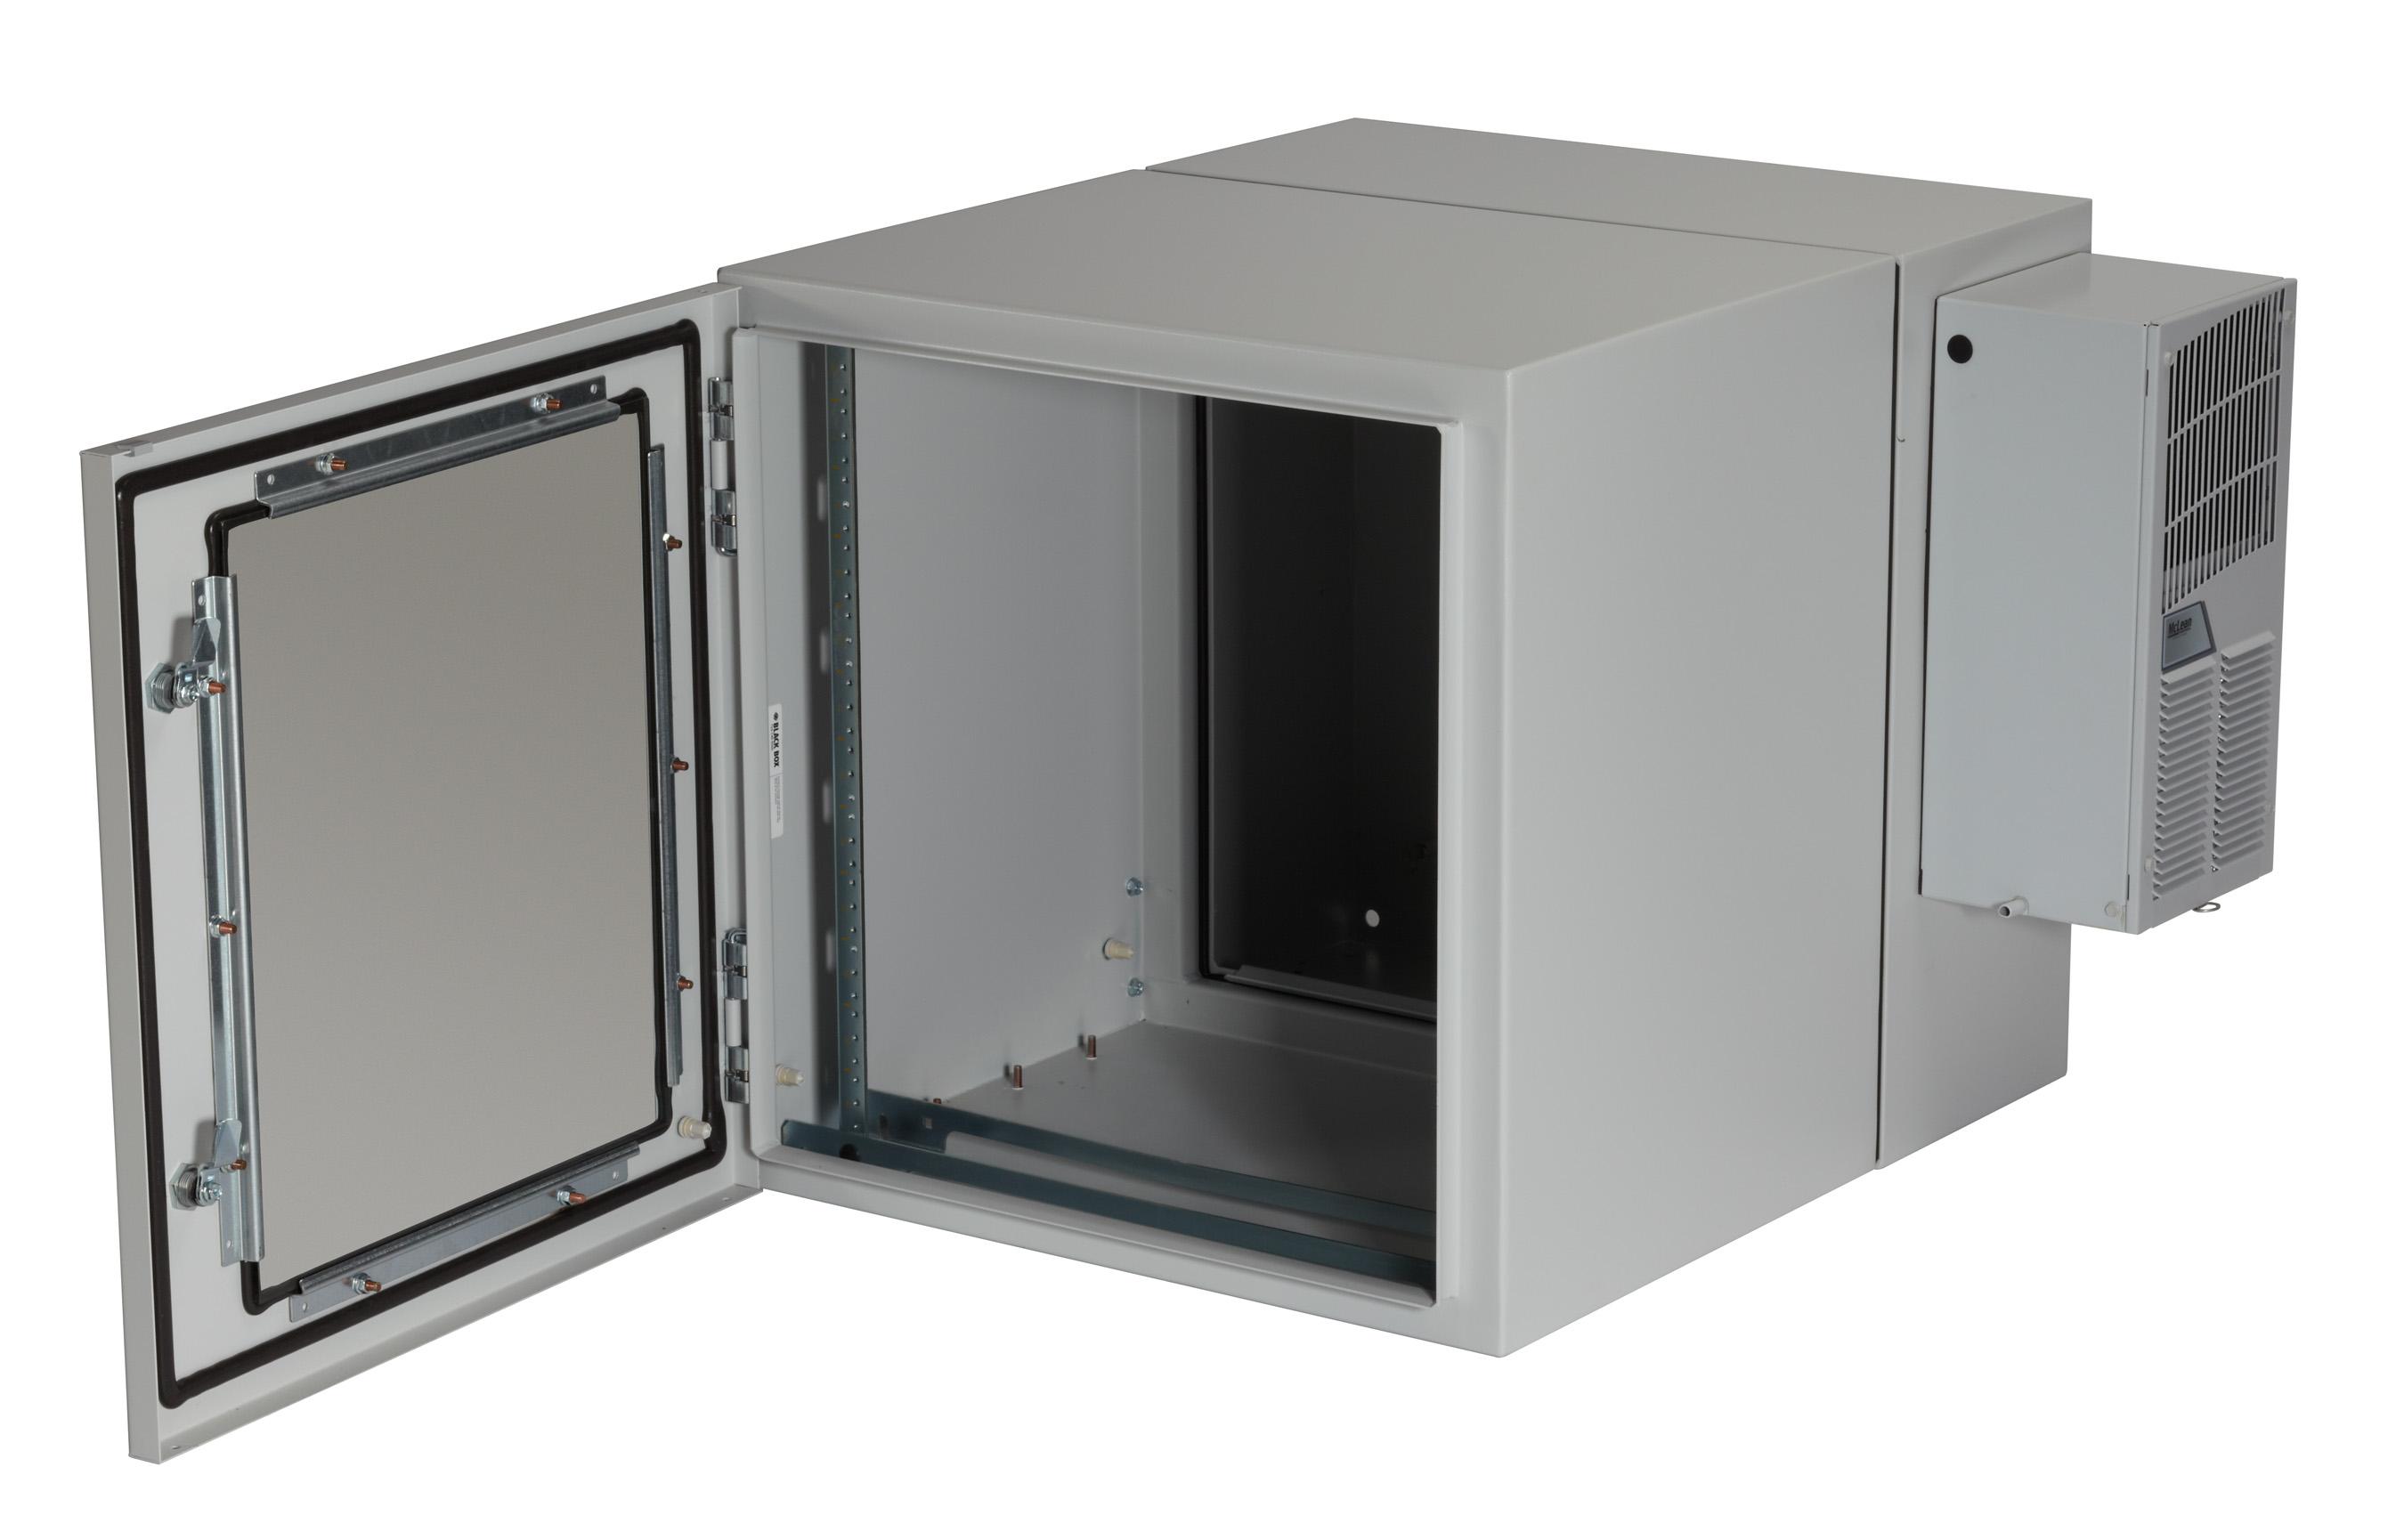 NEMA 12 Wallmount Cabinet 800-BTU AC - 12U | Black Box